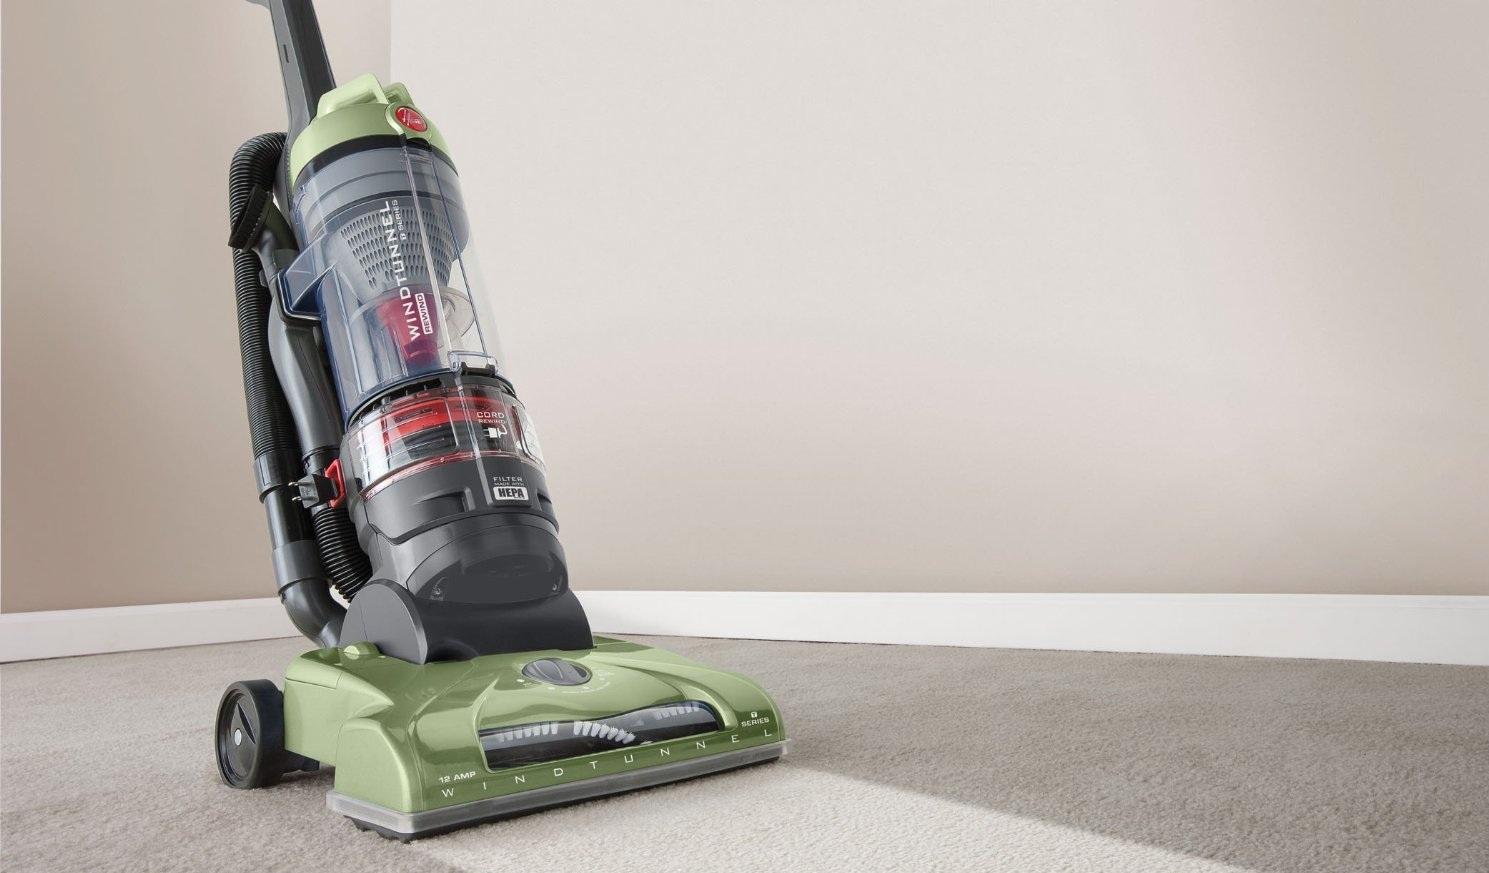 abc73581b0d Hoover WindTunnel T-Series Rewind Plus Bagless Upright Vacuum